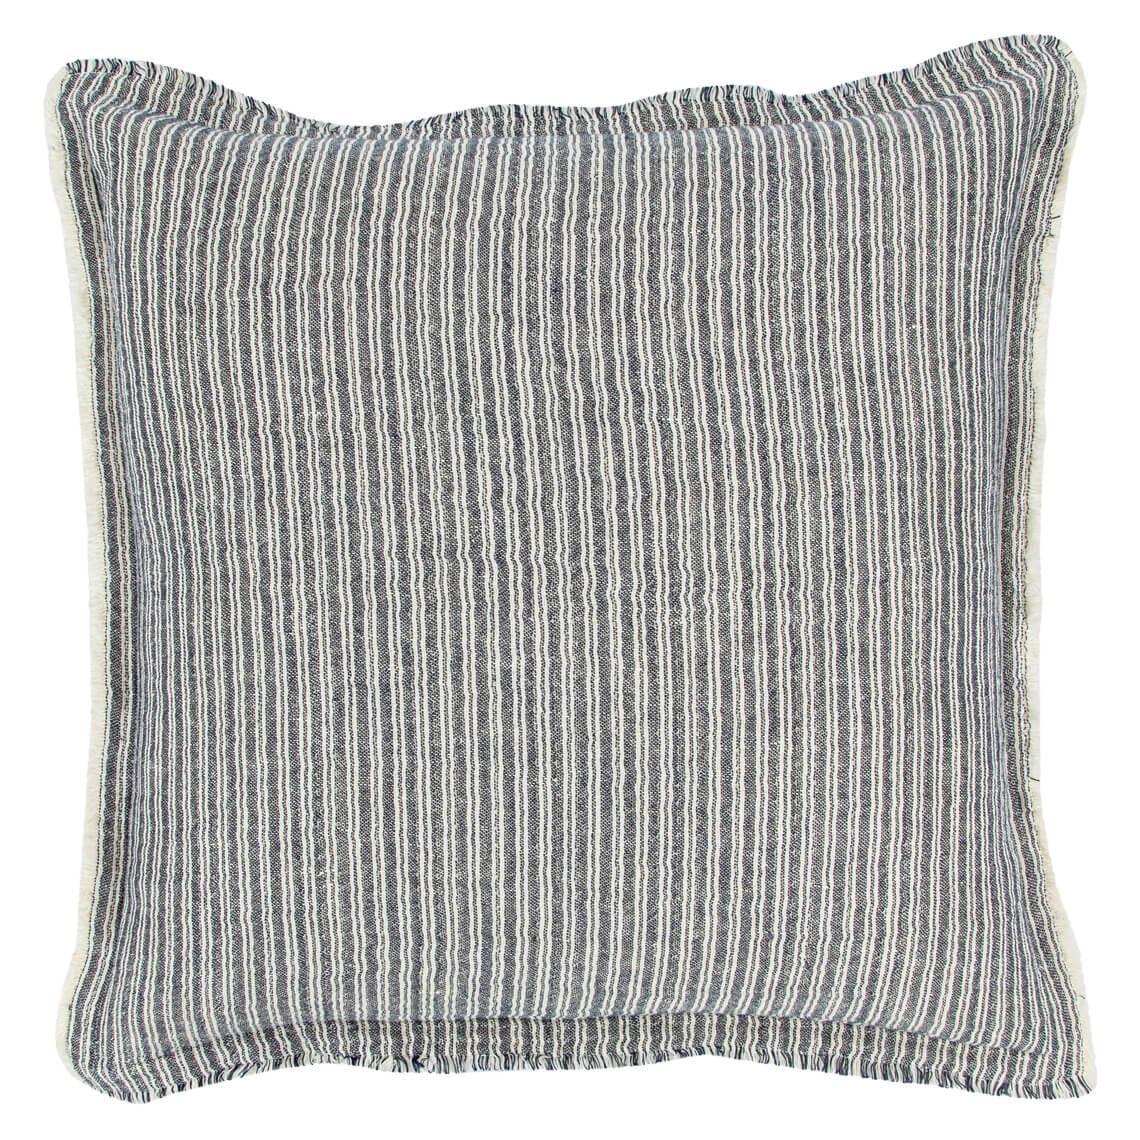 Amory Cushion Size W 55cm x D 15cm x H 55cm in Blue Freedom